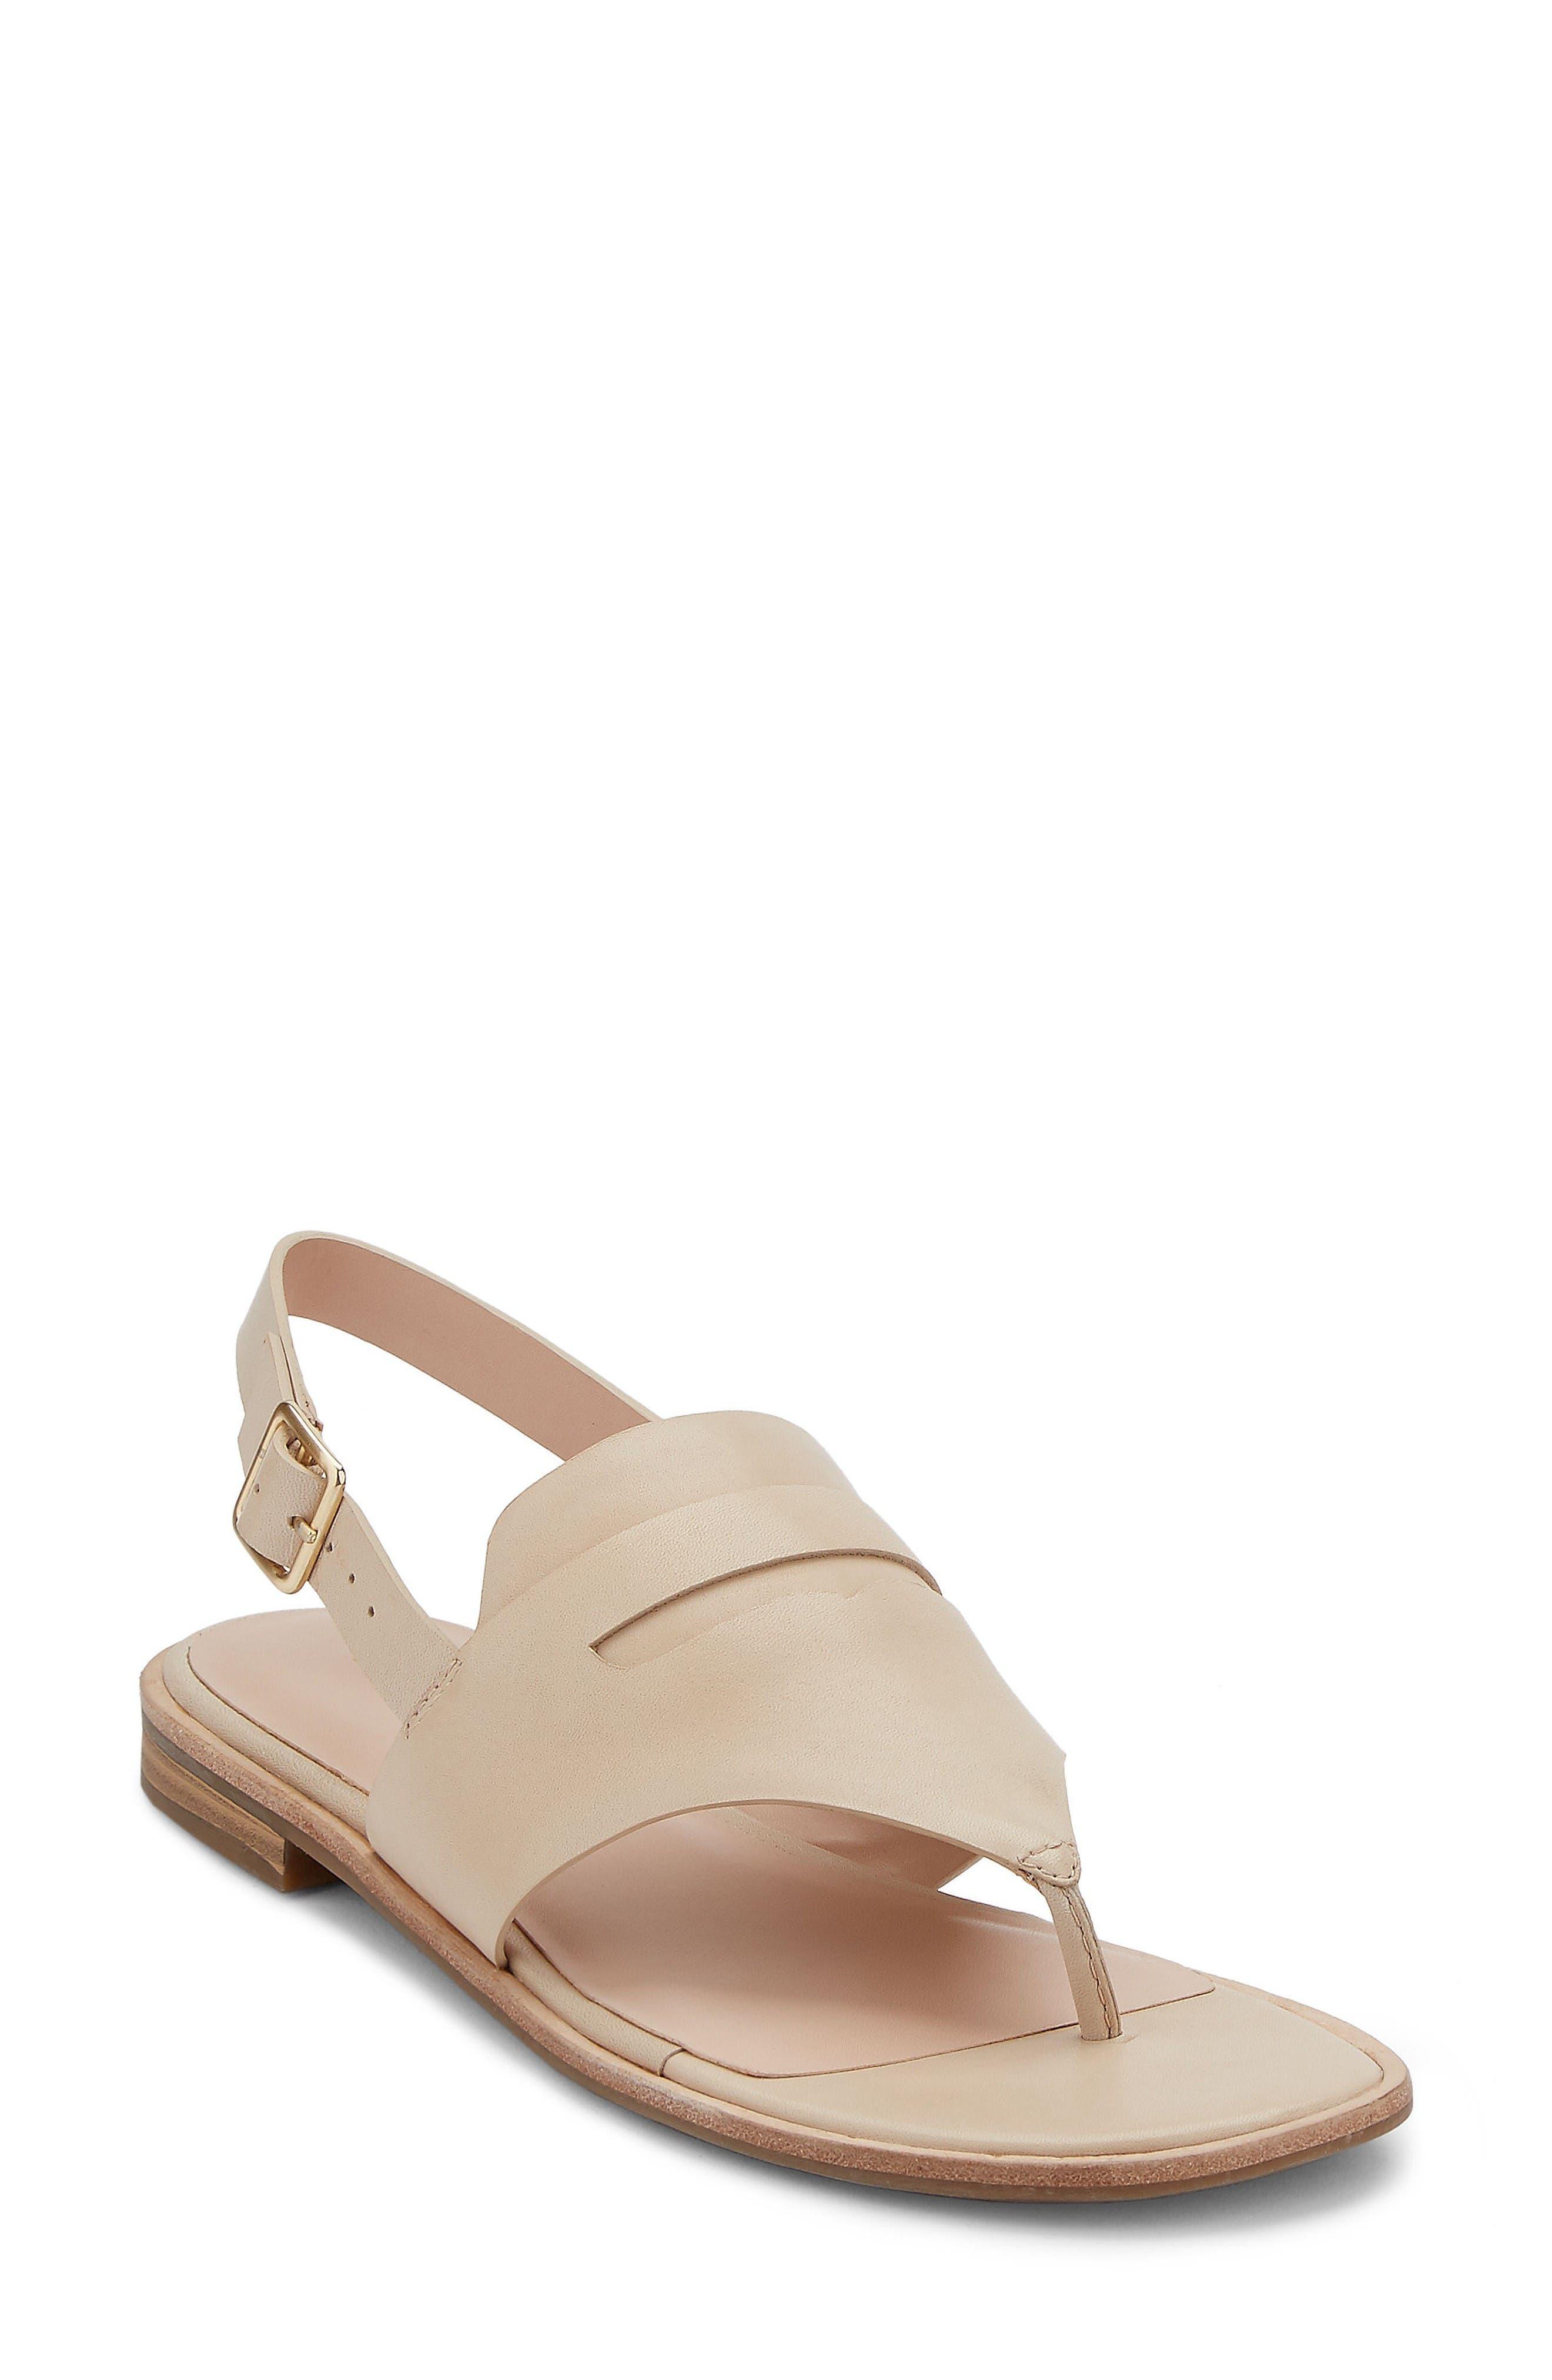 Maddie Slingback Sandal,                             Main thumbnail 1, color,                             Cream Leather